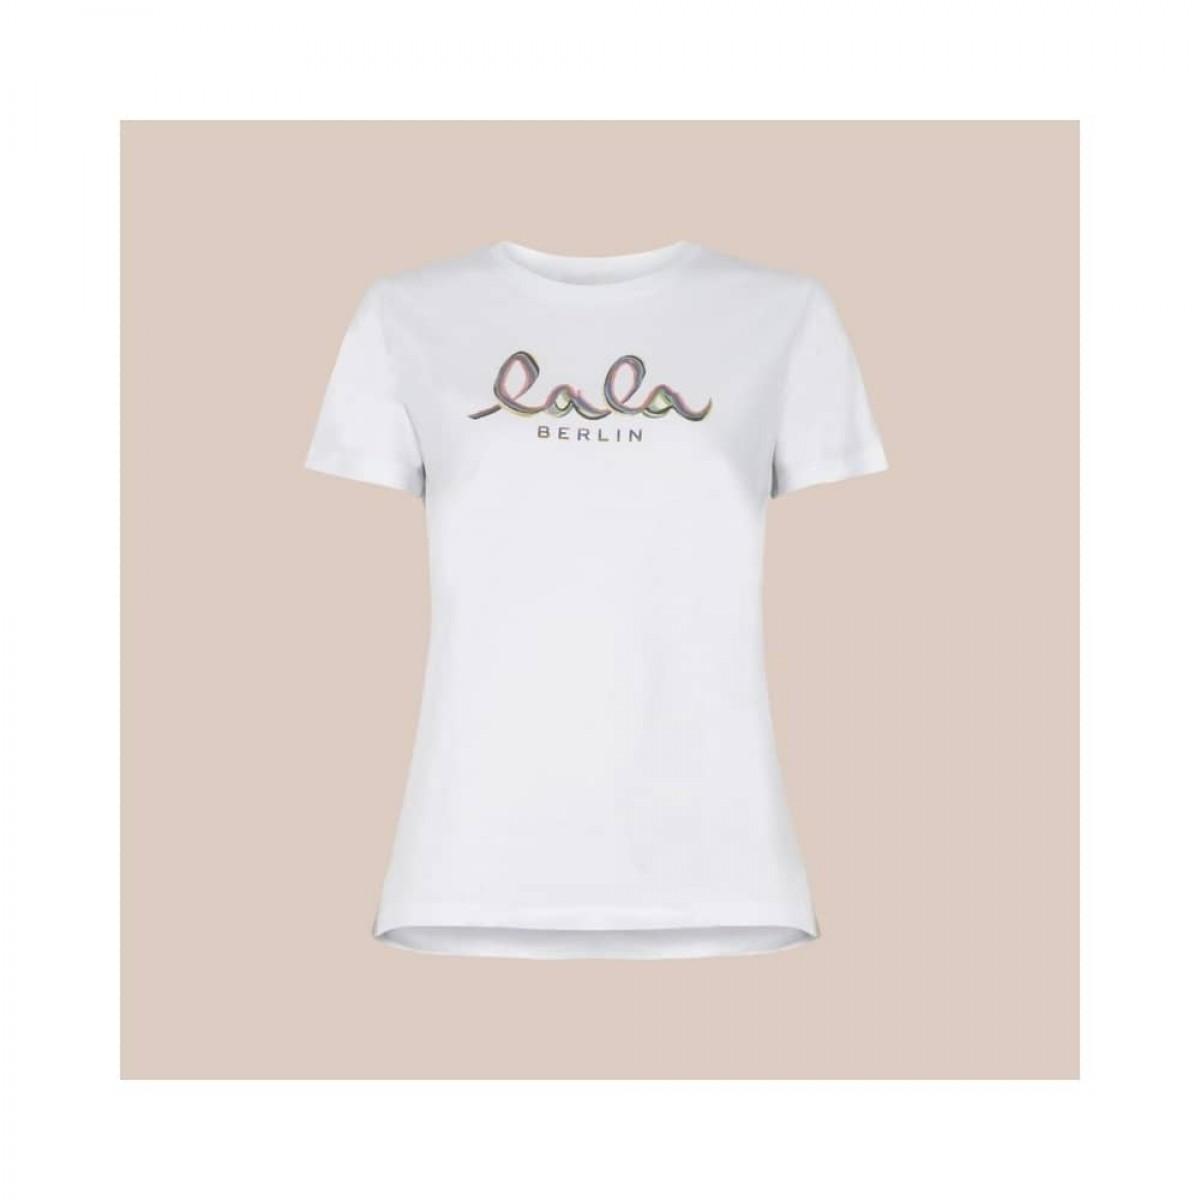 cara t-shirt rainbow - white - front